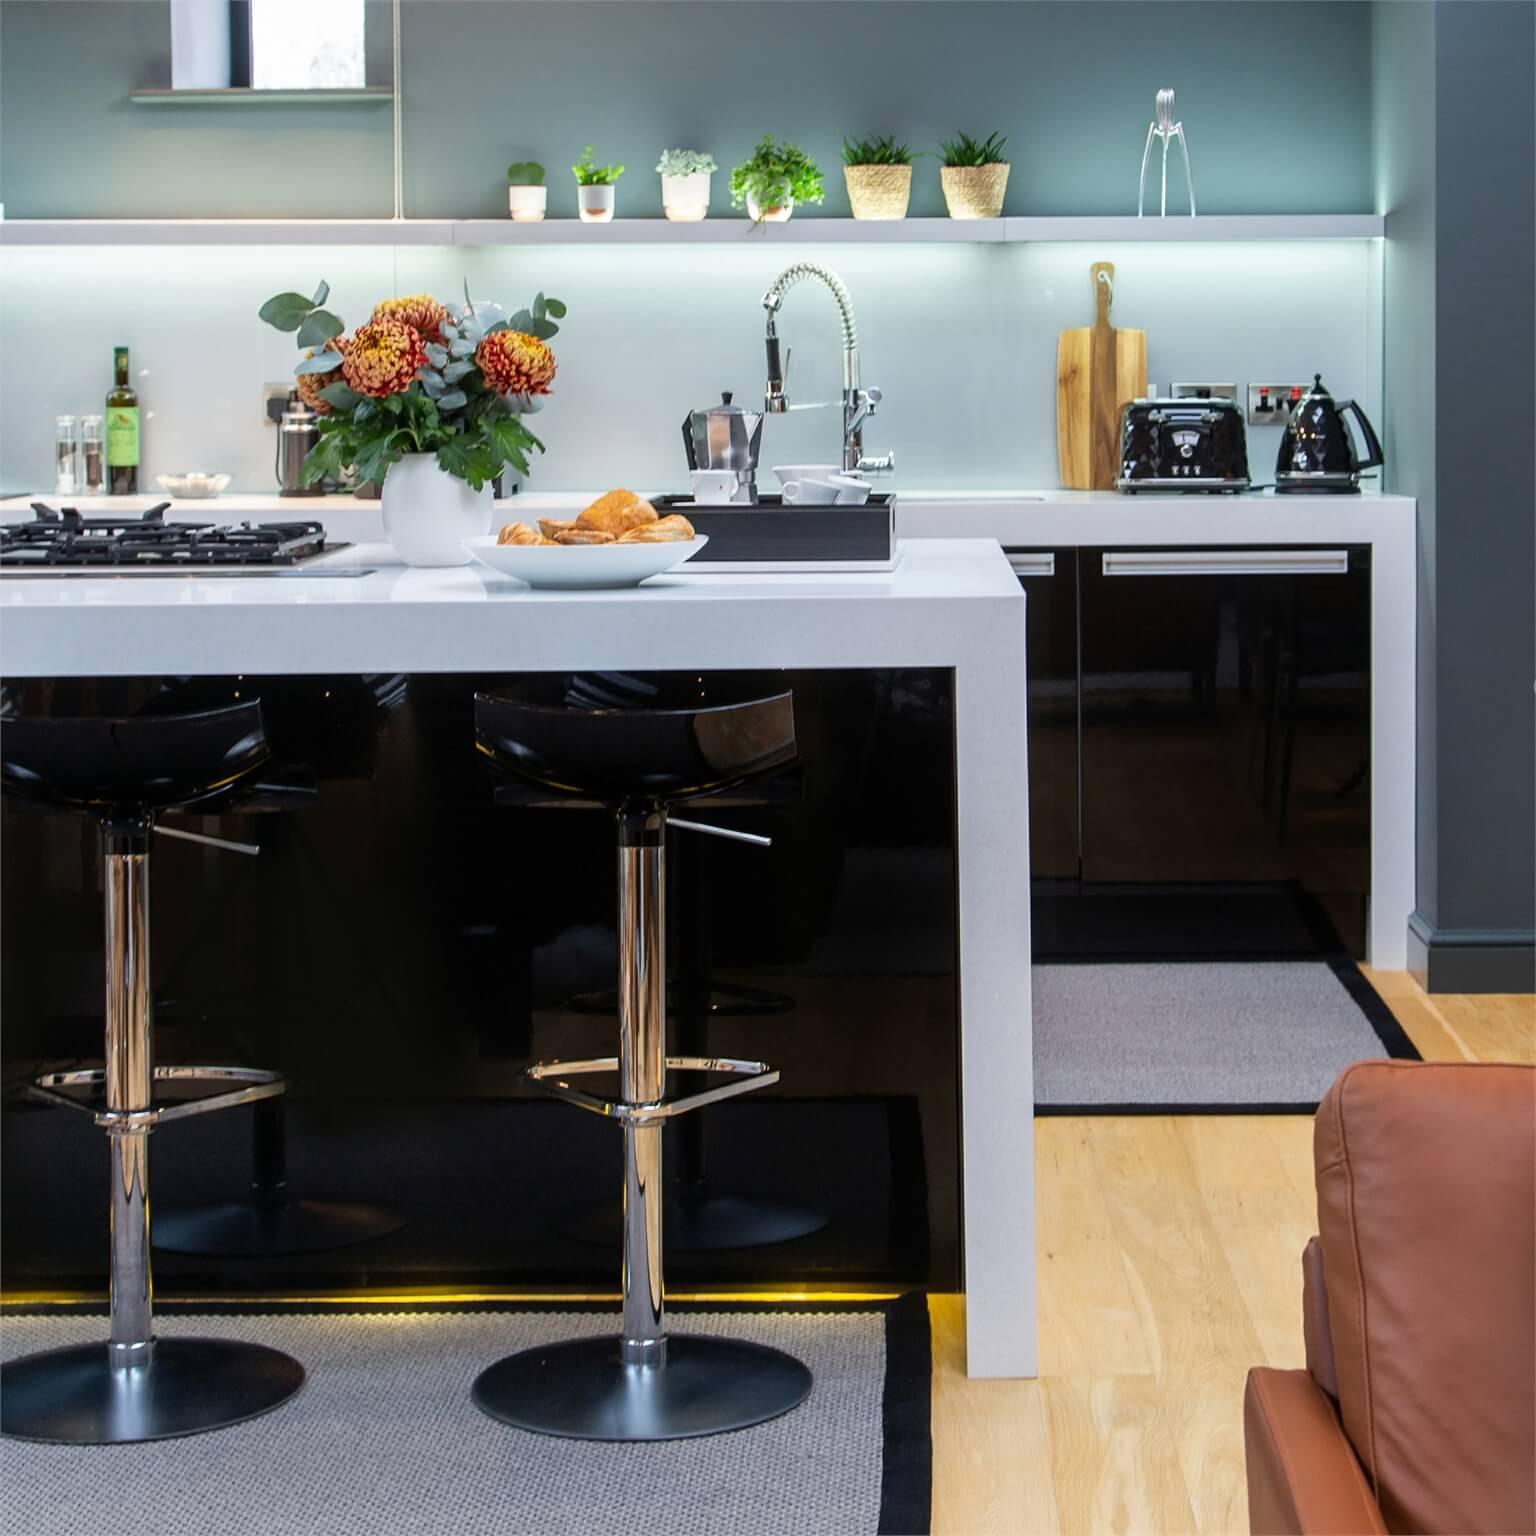 Downpipe walls bring drama to this sociable kitchen